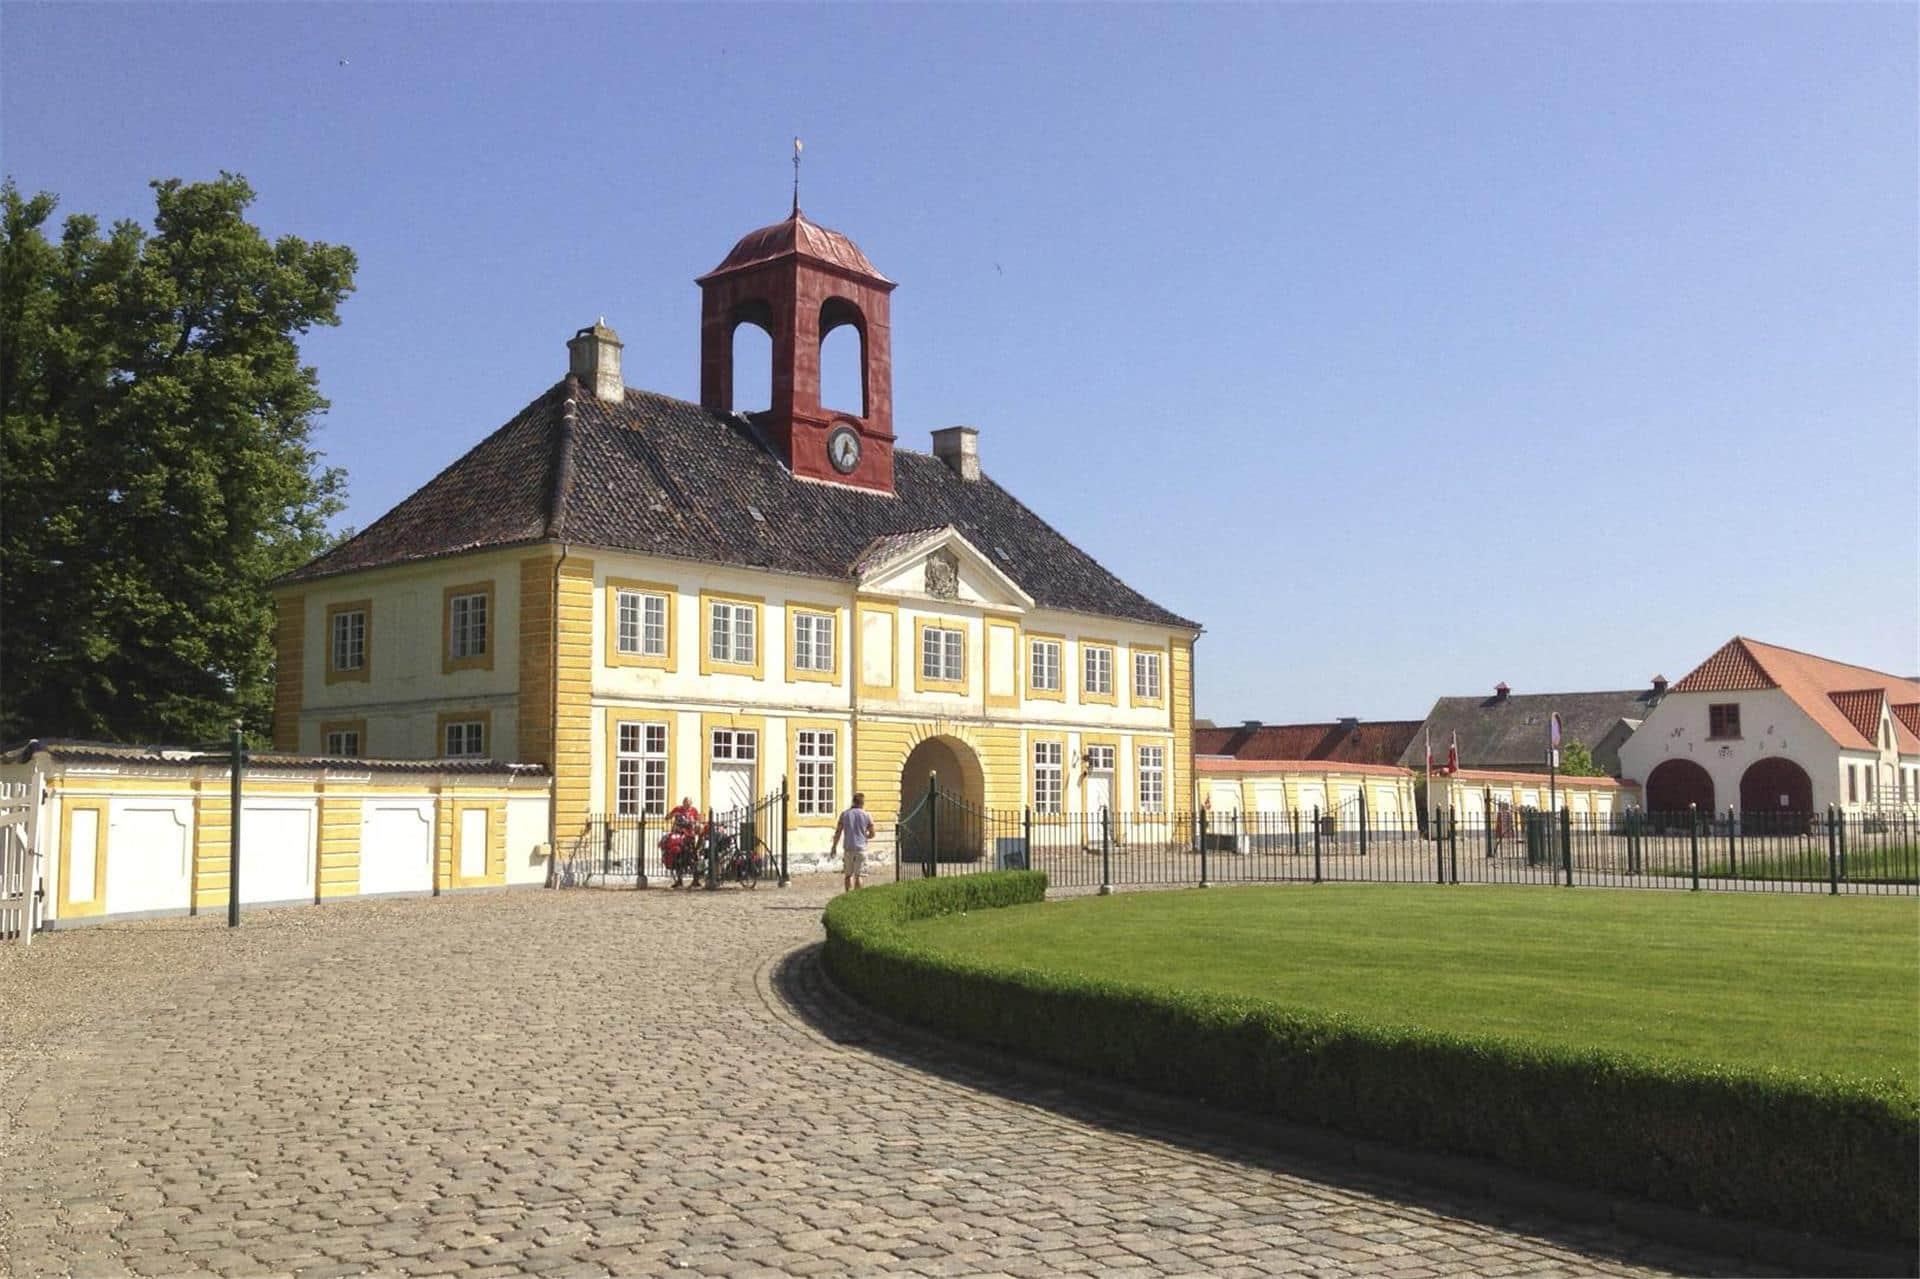 Bild 1-3 Ferienhaus M68011, Slotsalleen 100, DK - 5700 Svendborg